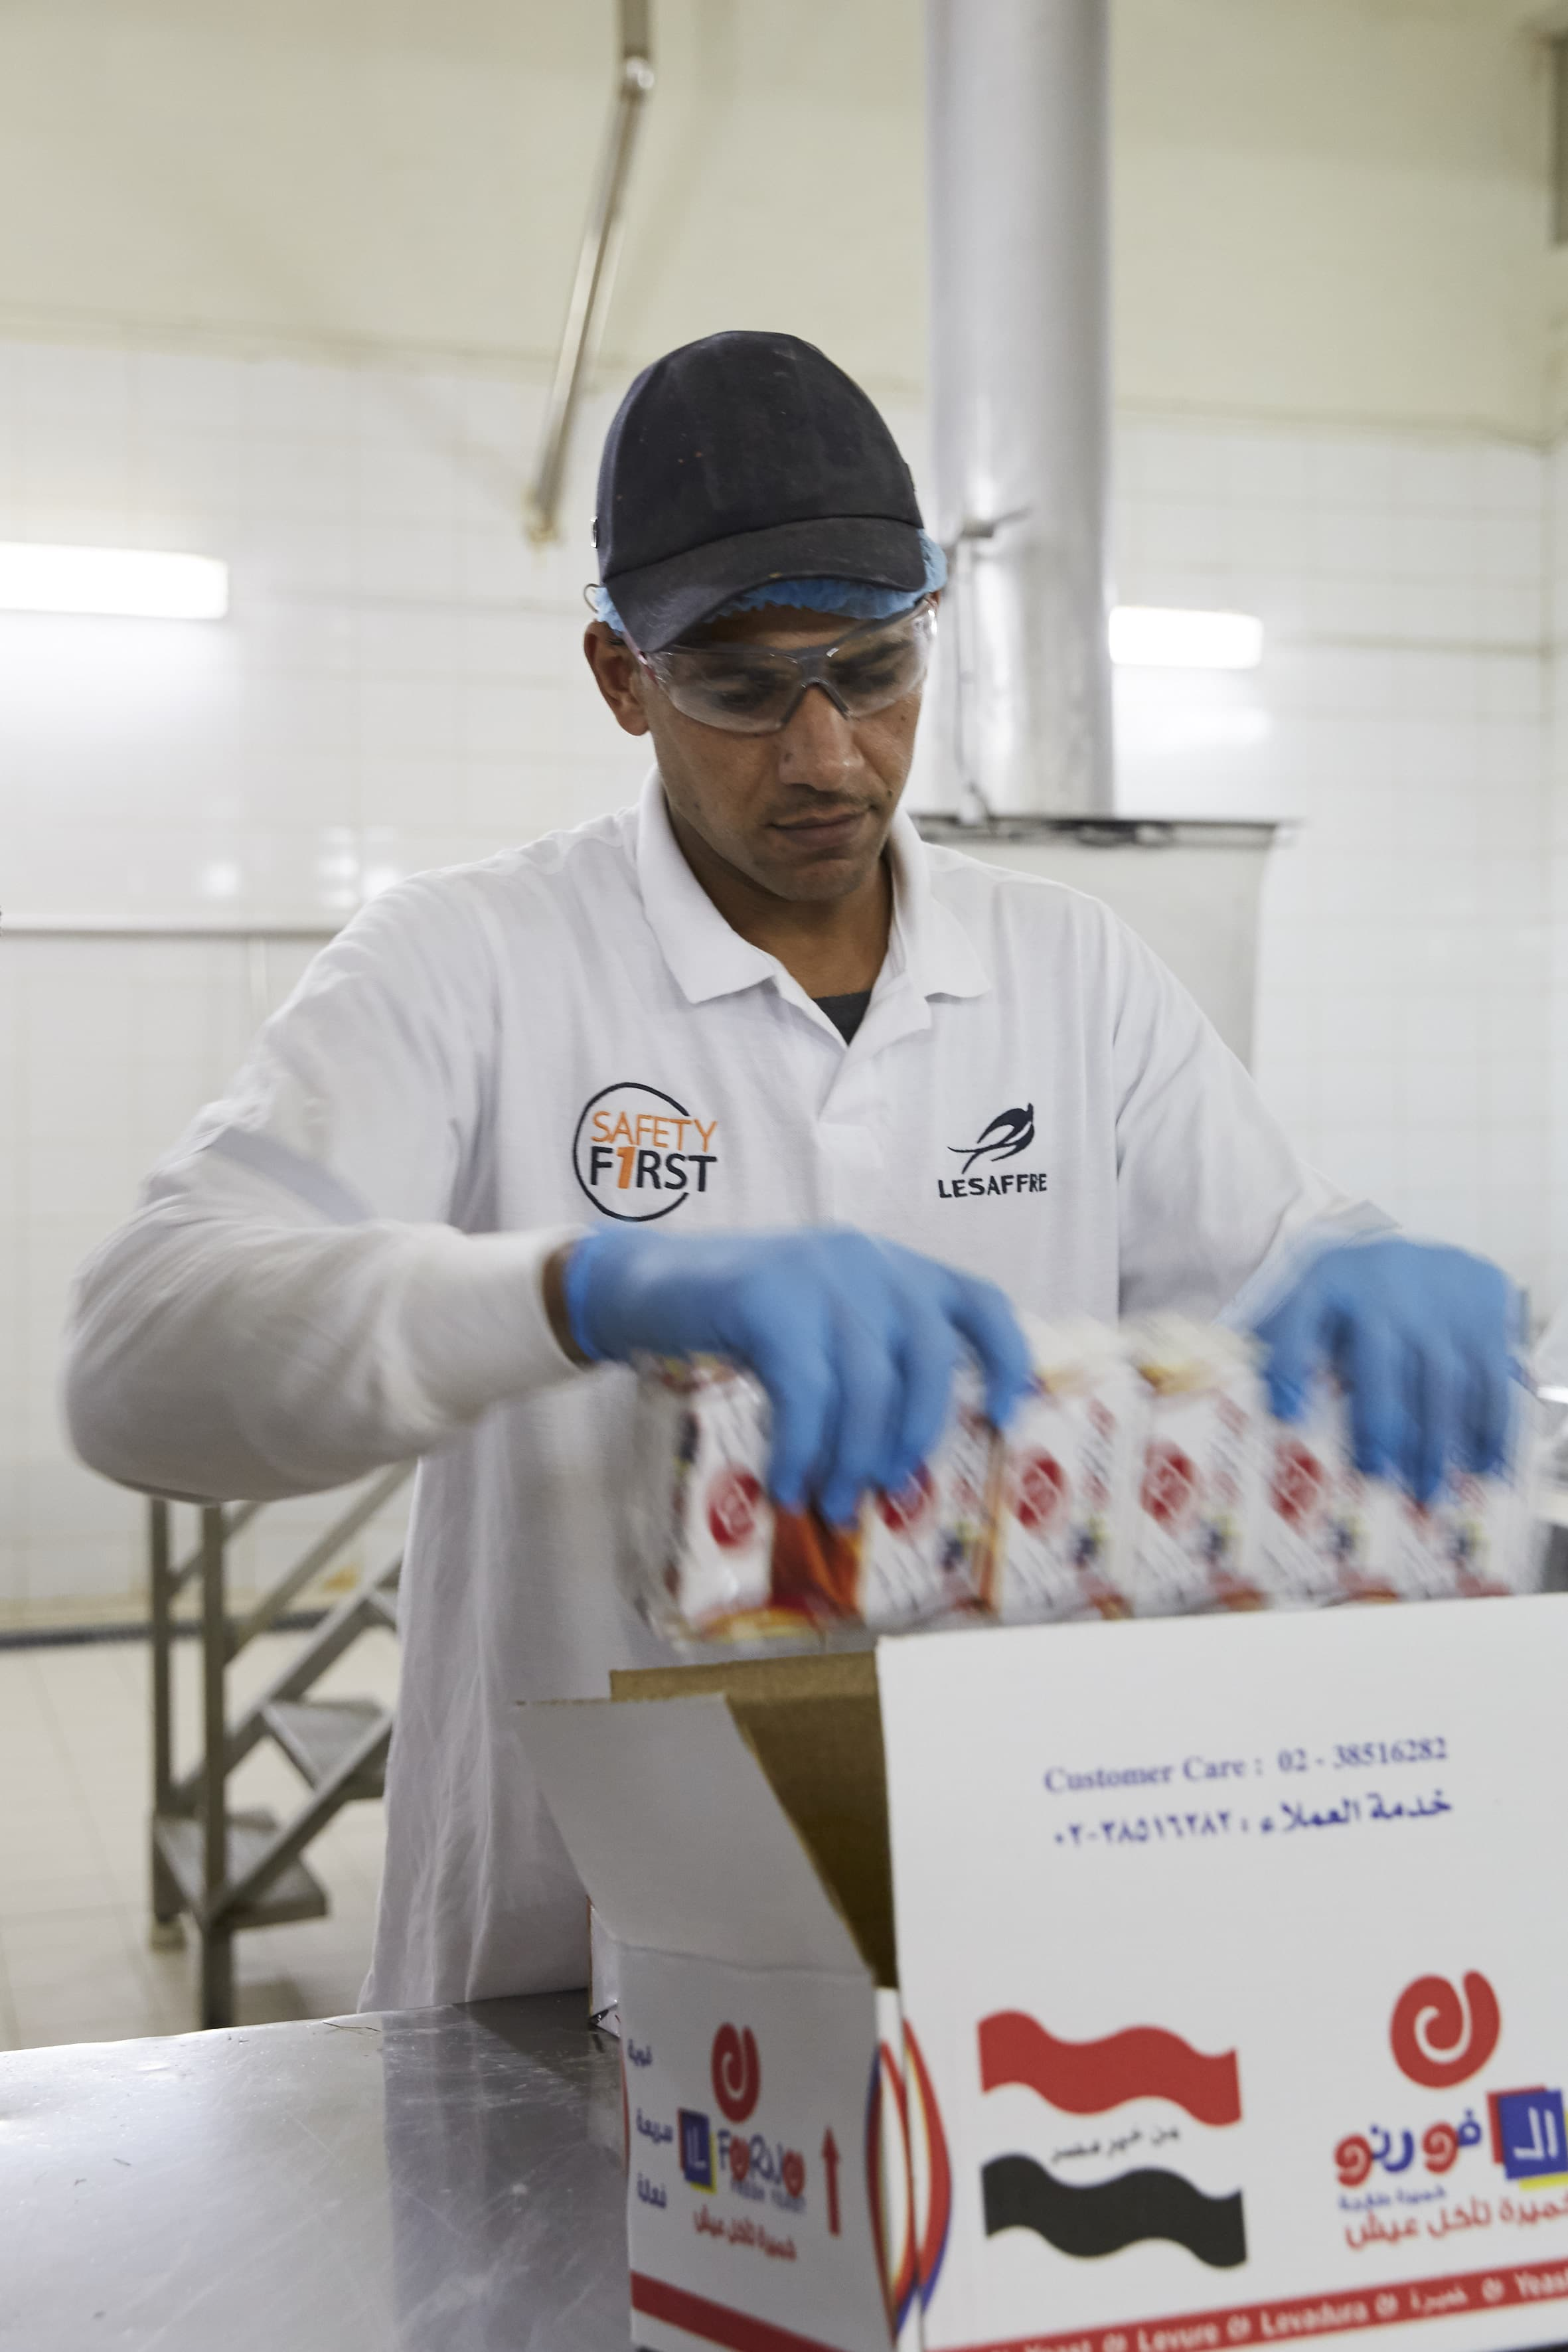 yeast logistics